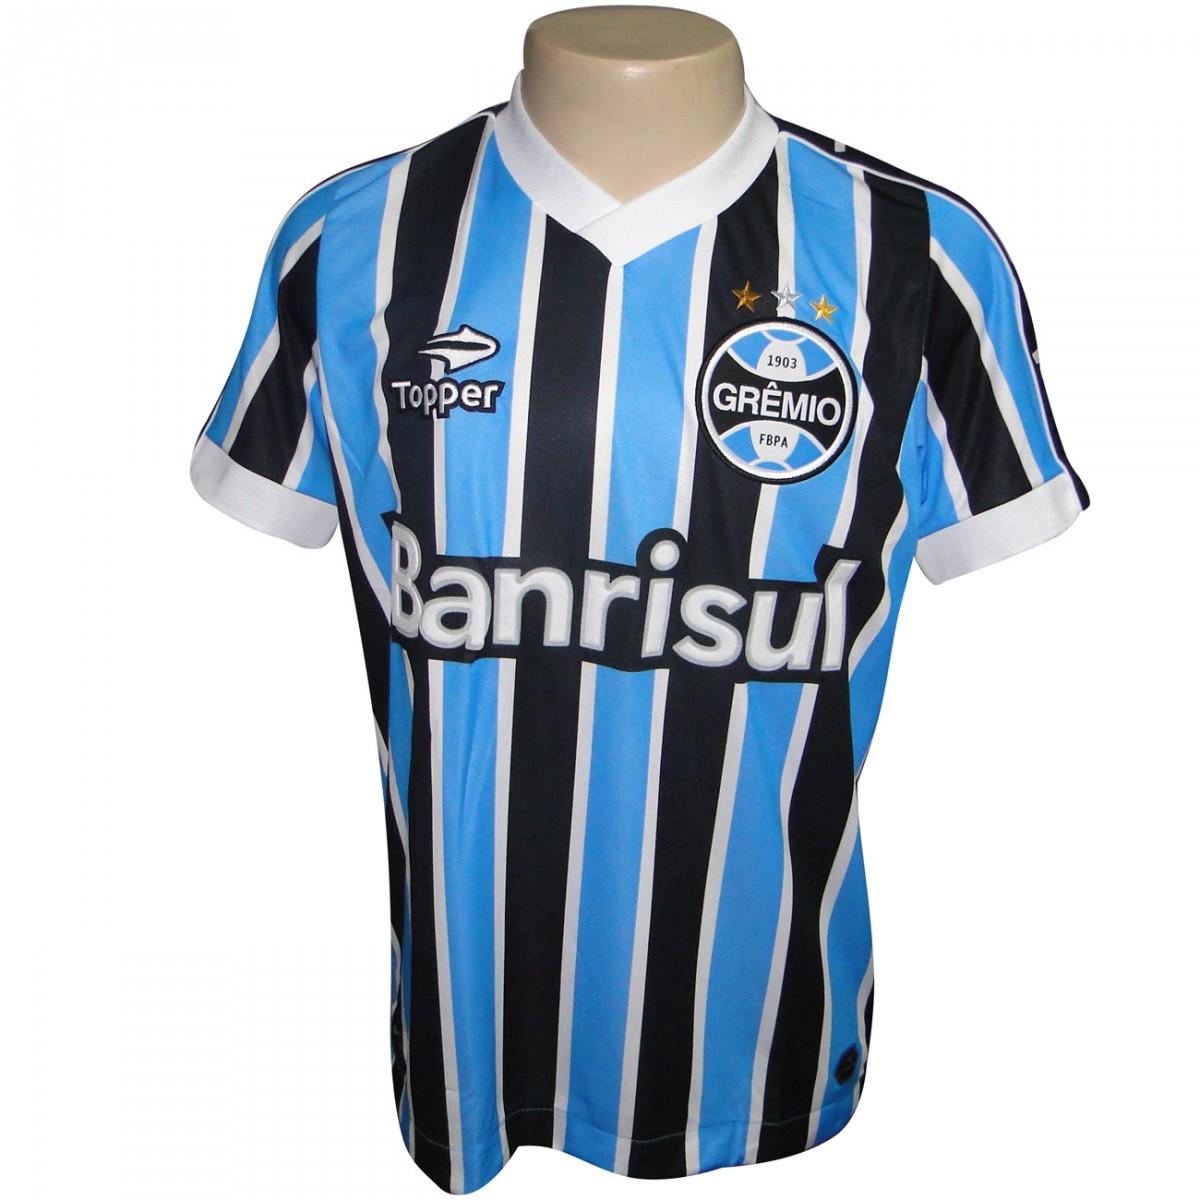 Camisa Gremio Topper 2013 2014 C2000M - Tricolor - Chuteira Nike ... 2a03c549450fd